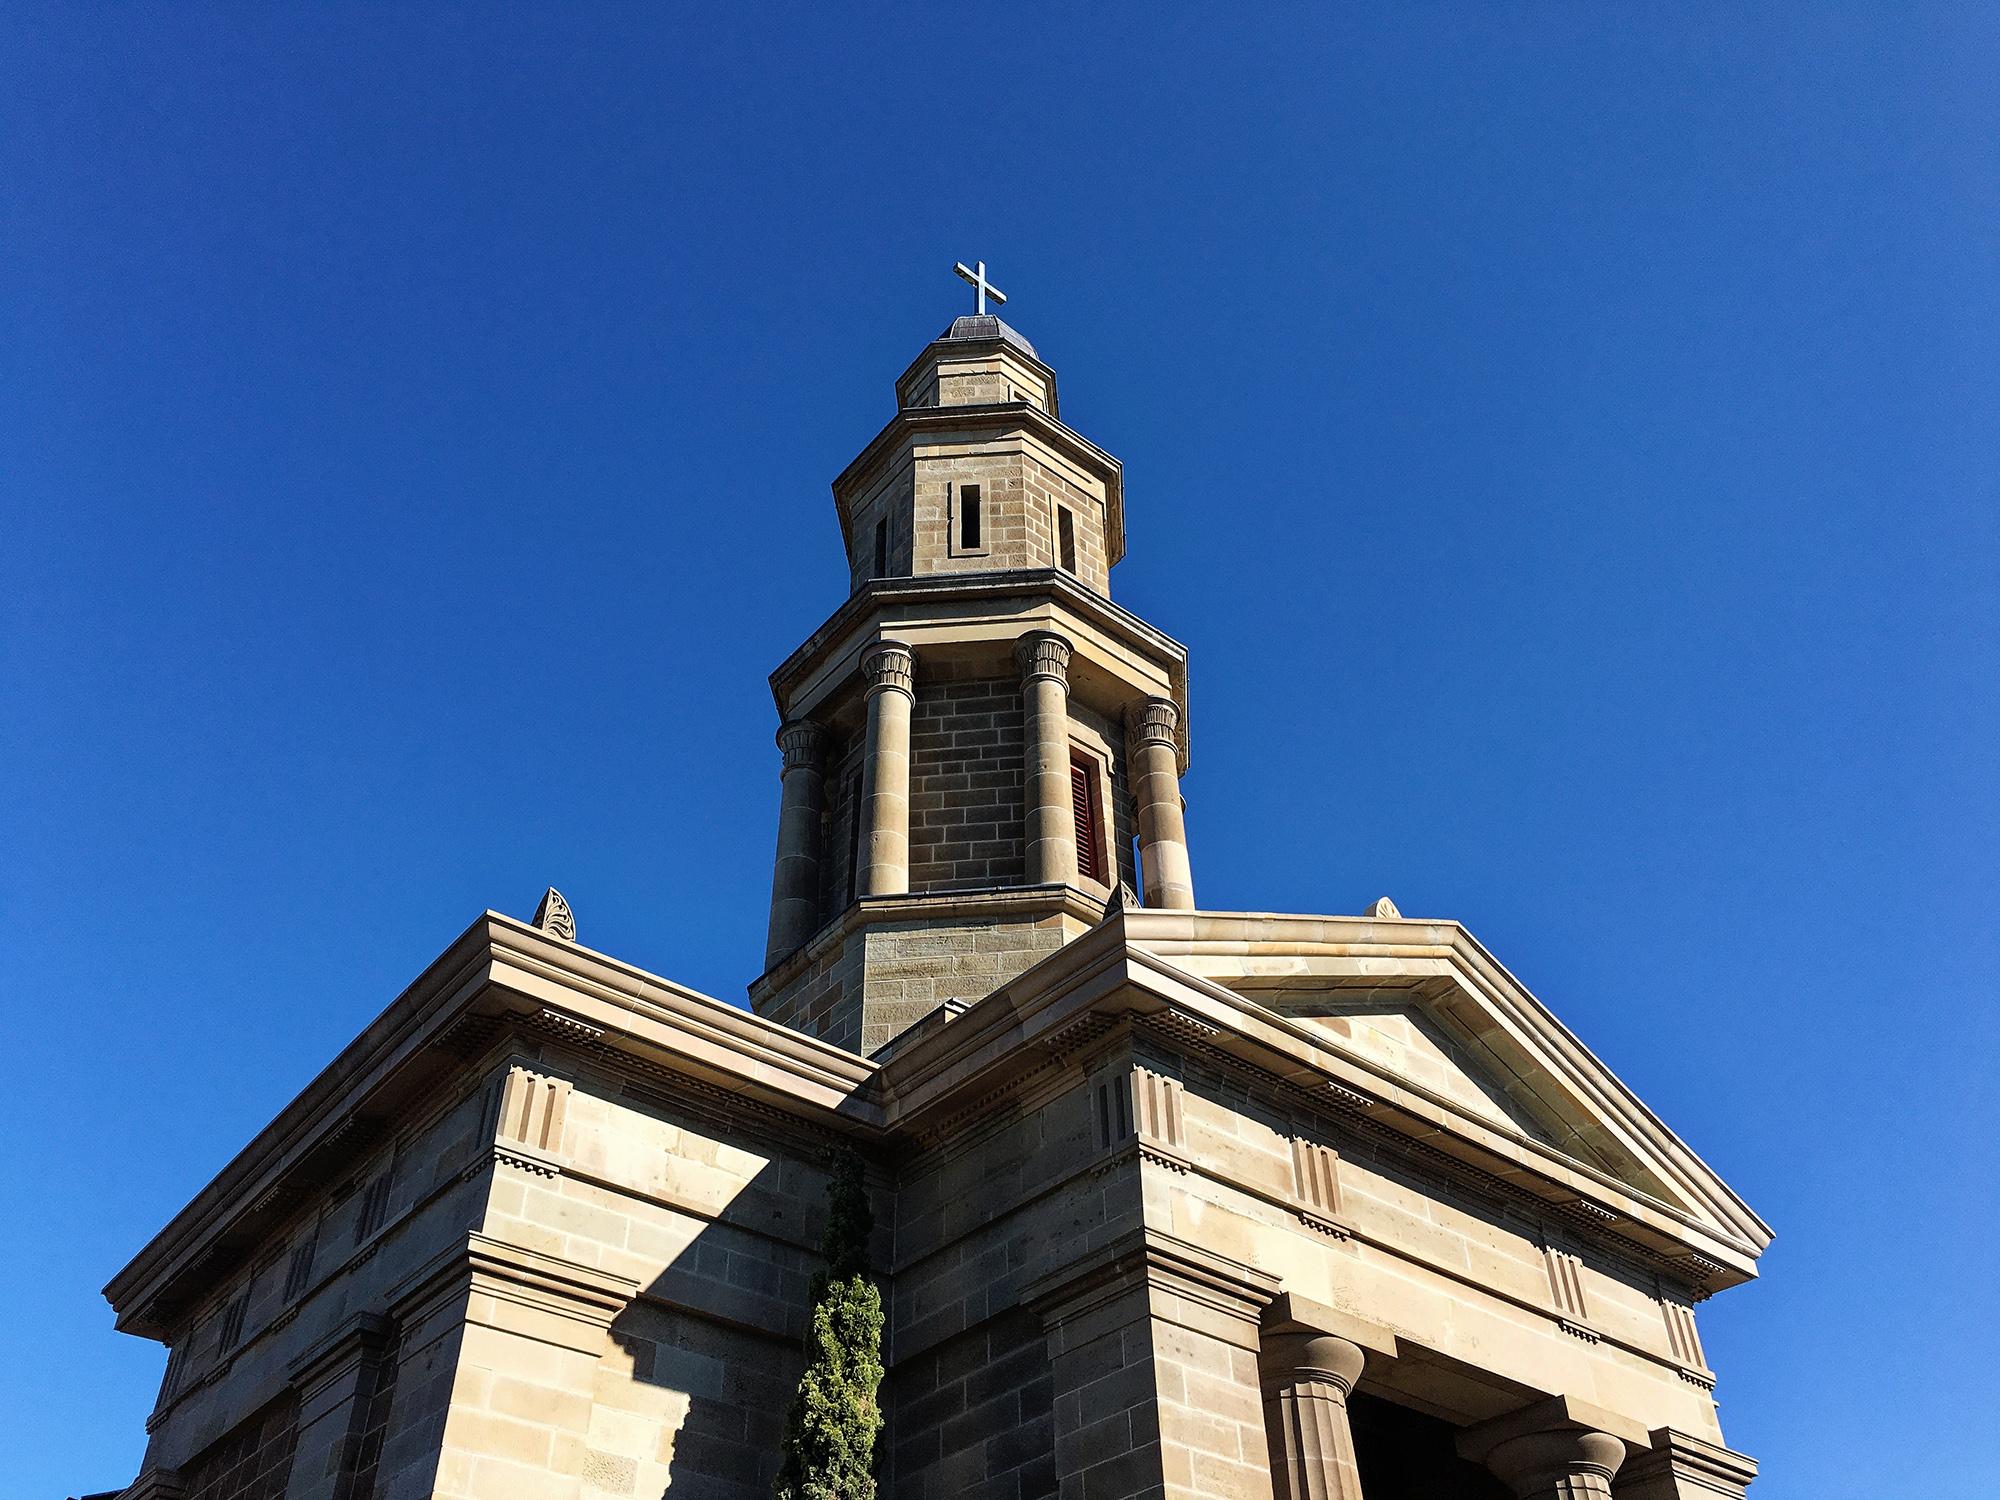 St George's stonework